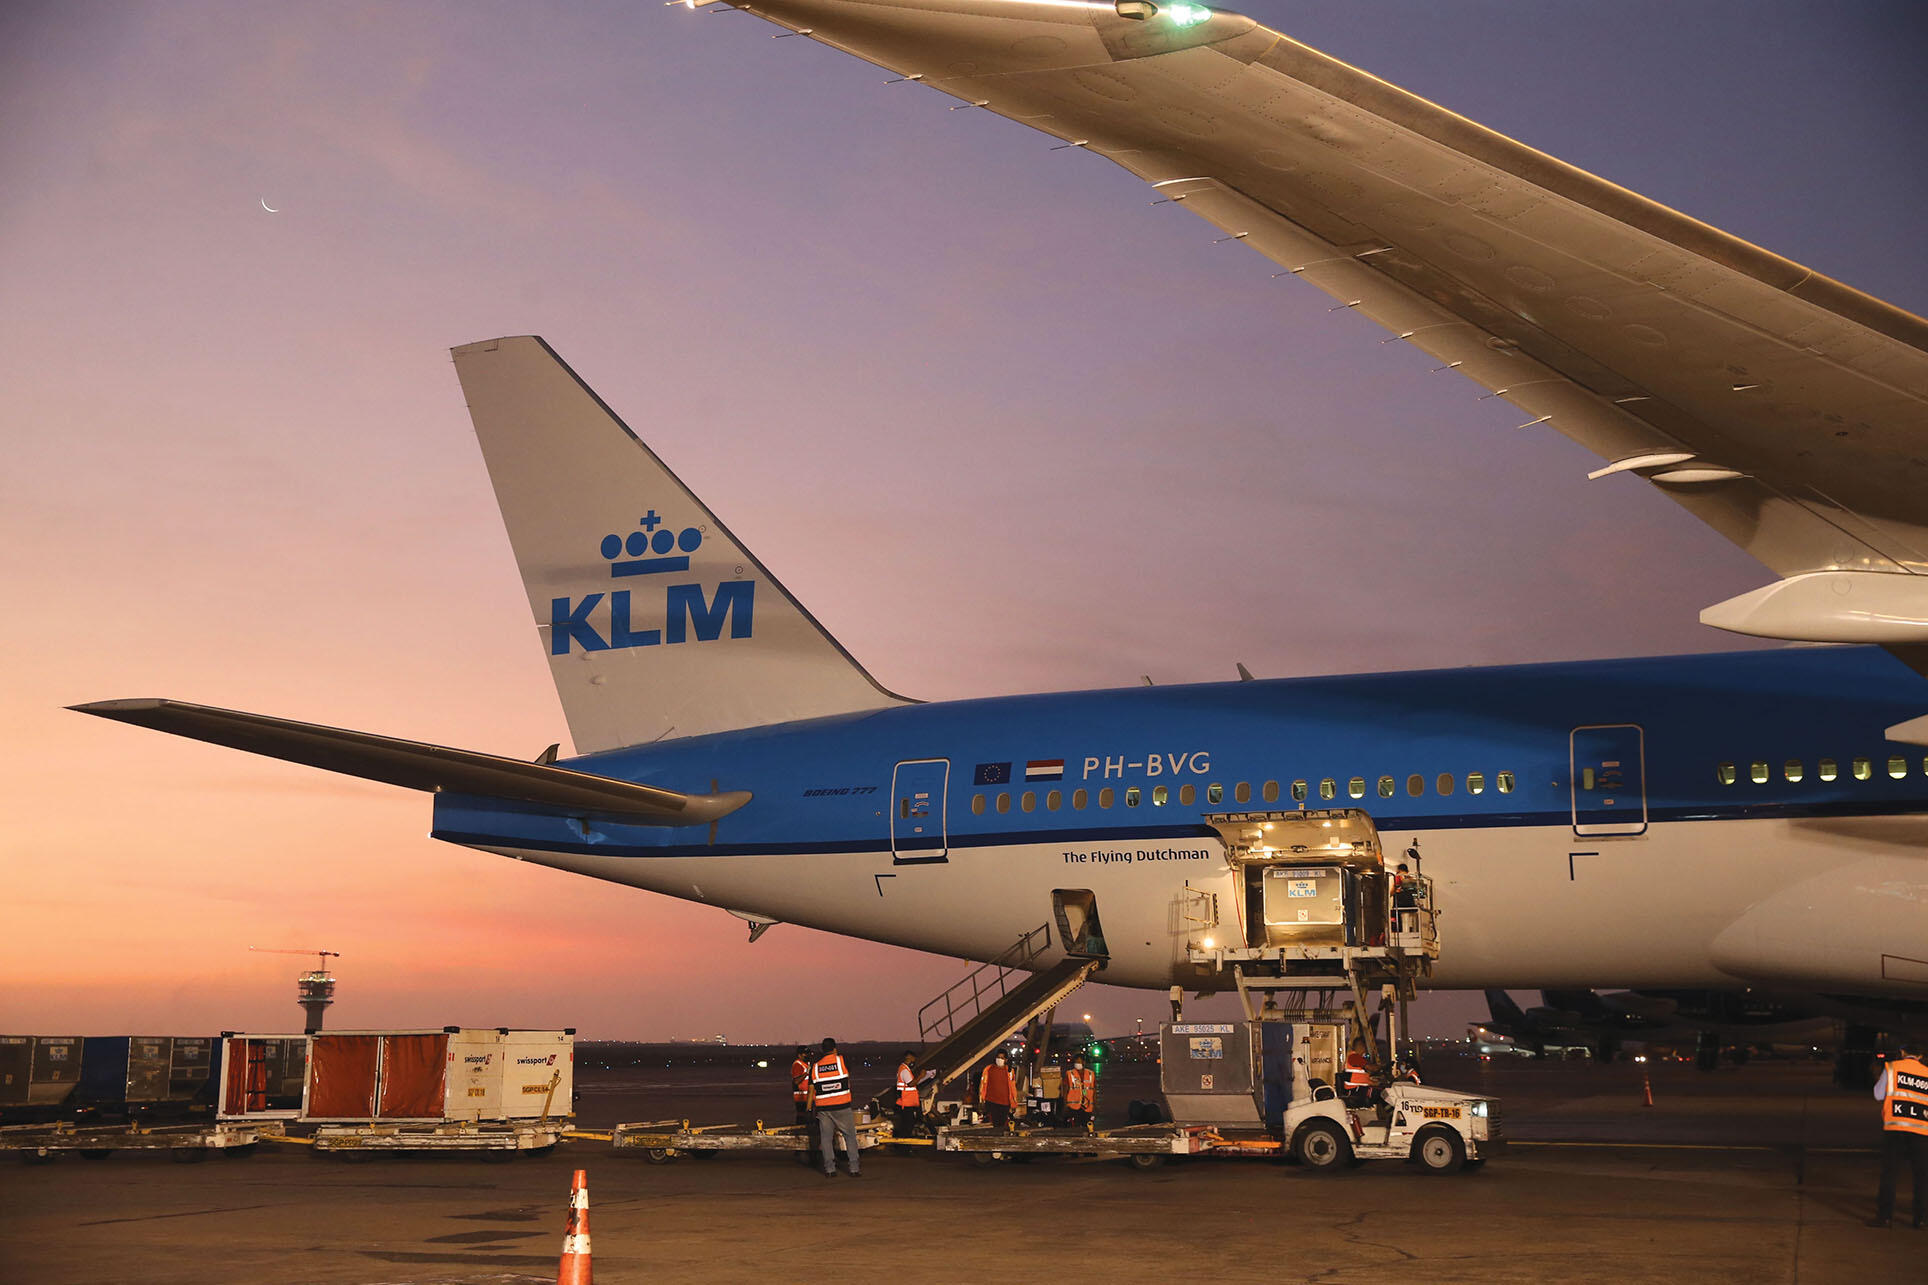 Pfizer Covid-19 vaccines are unloaded from a KLM airliner in Peru, April 2021. (Photo courtesy of the Ministerio de Educación de Perú.)